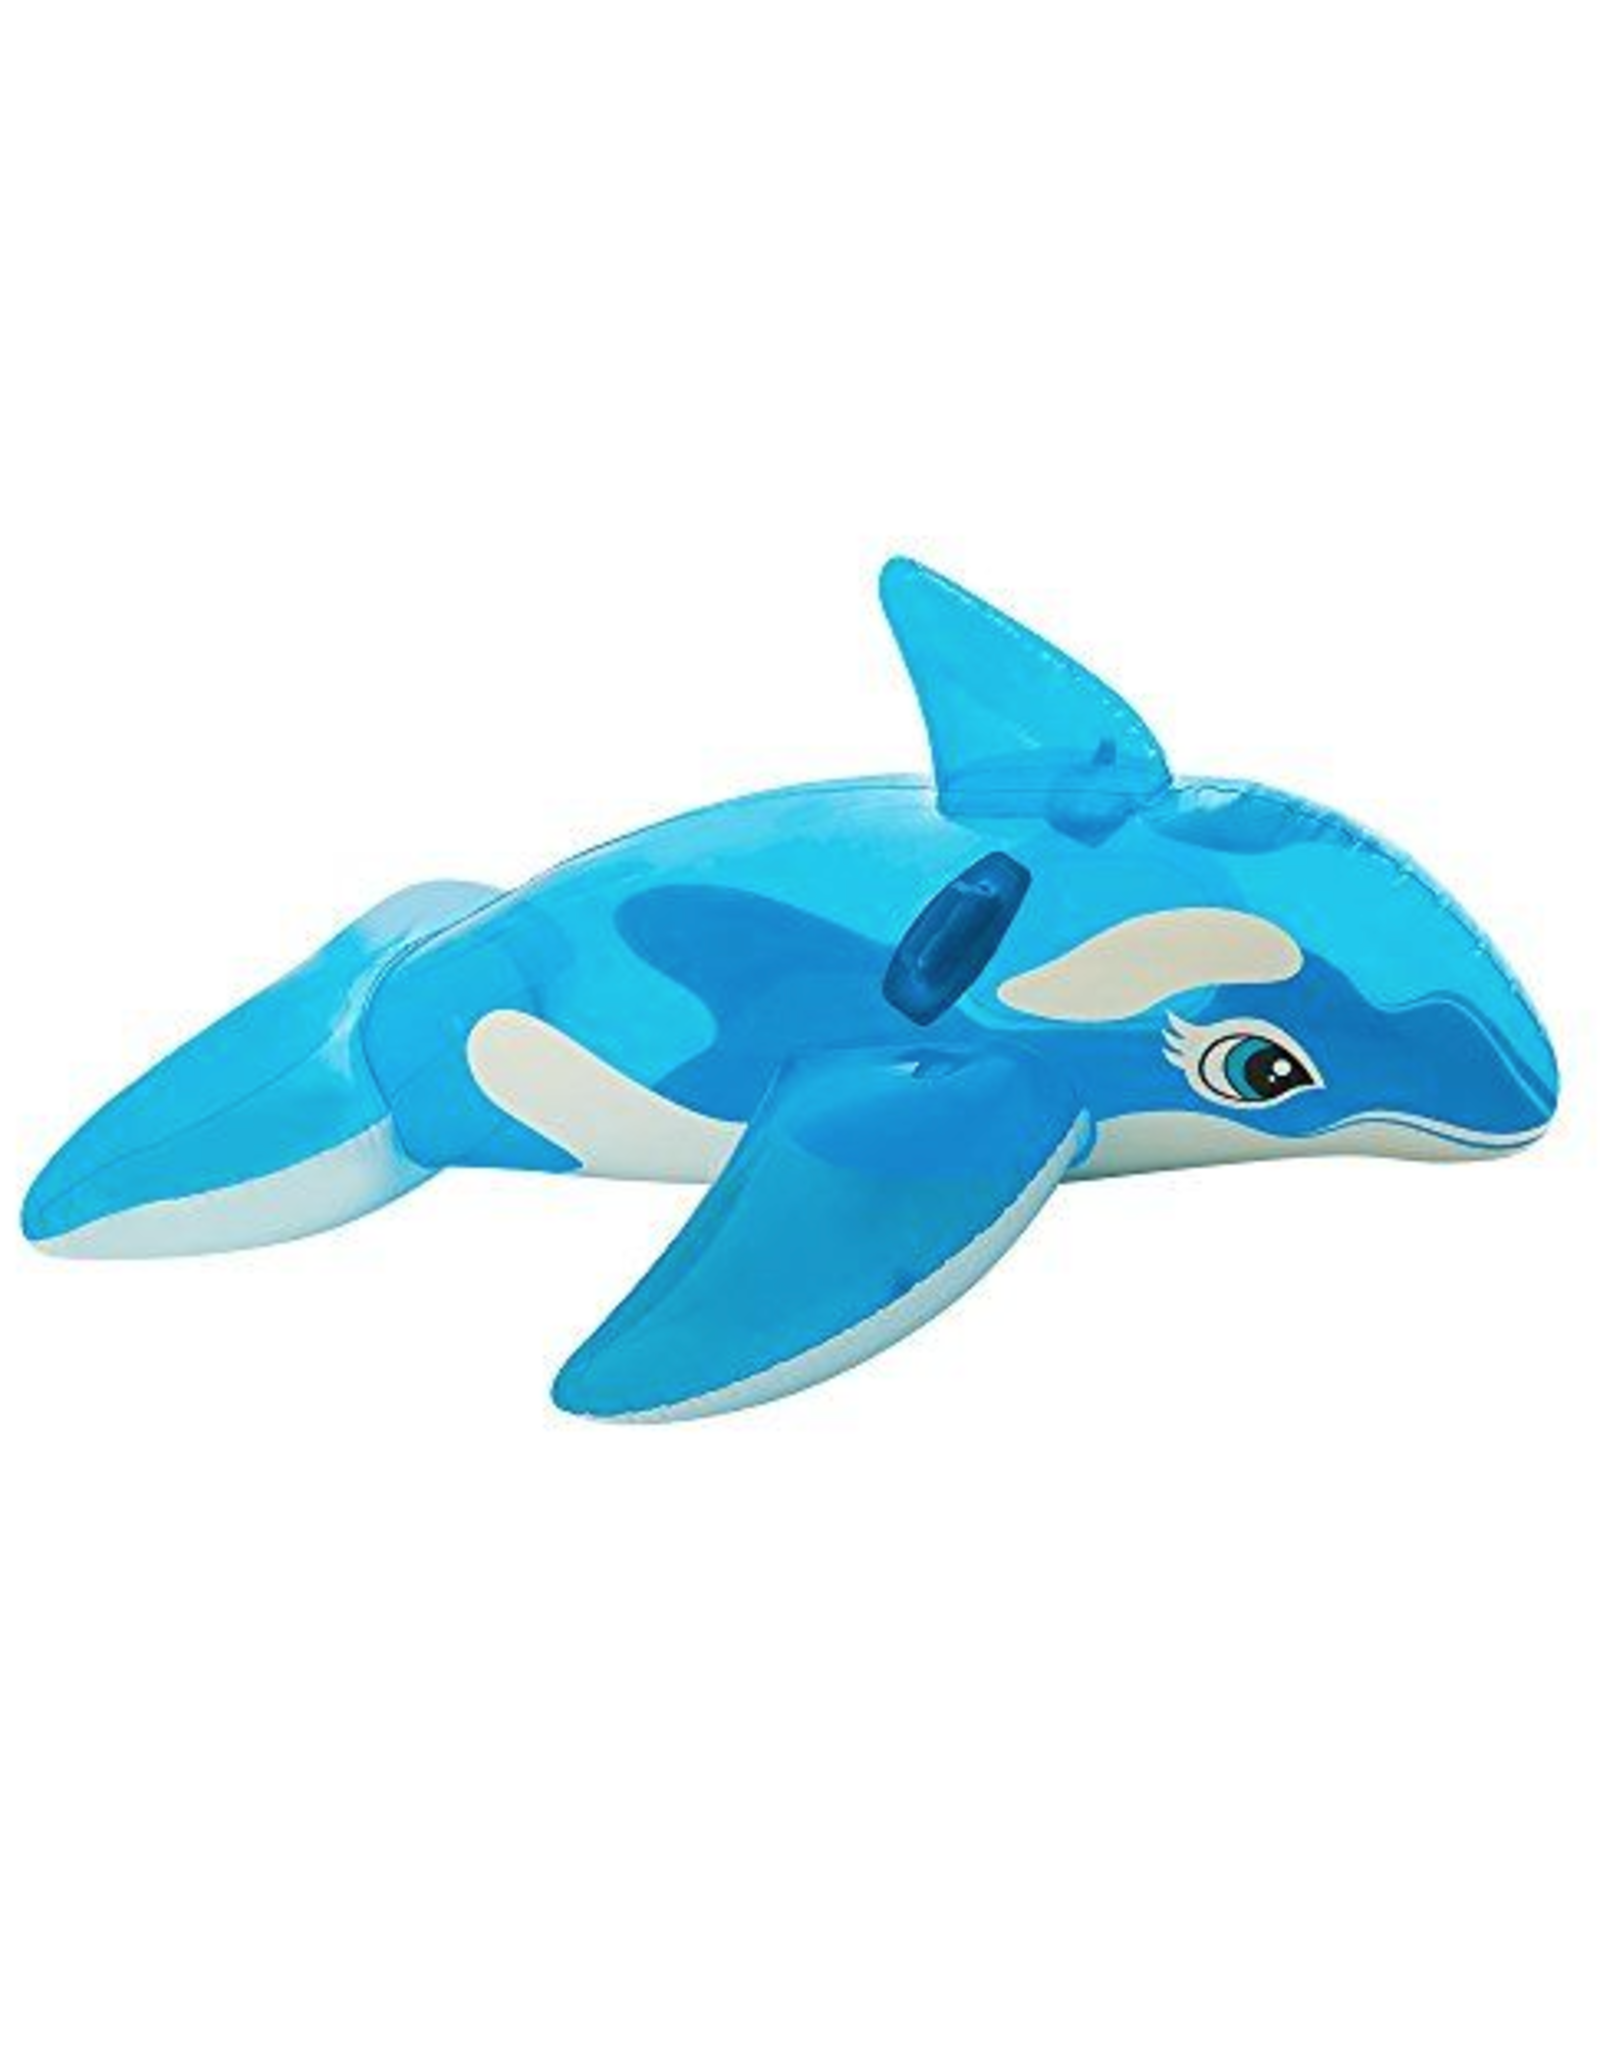 Intex Ride-On Blue Whale